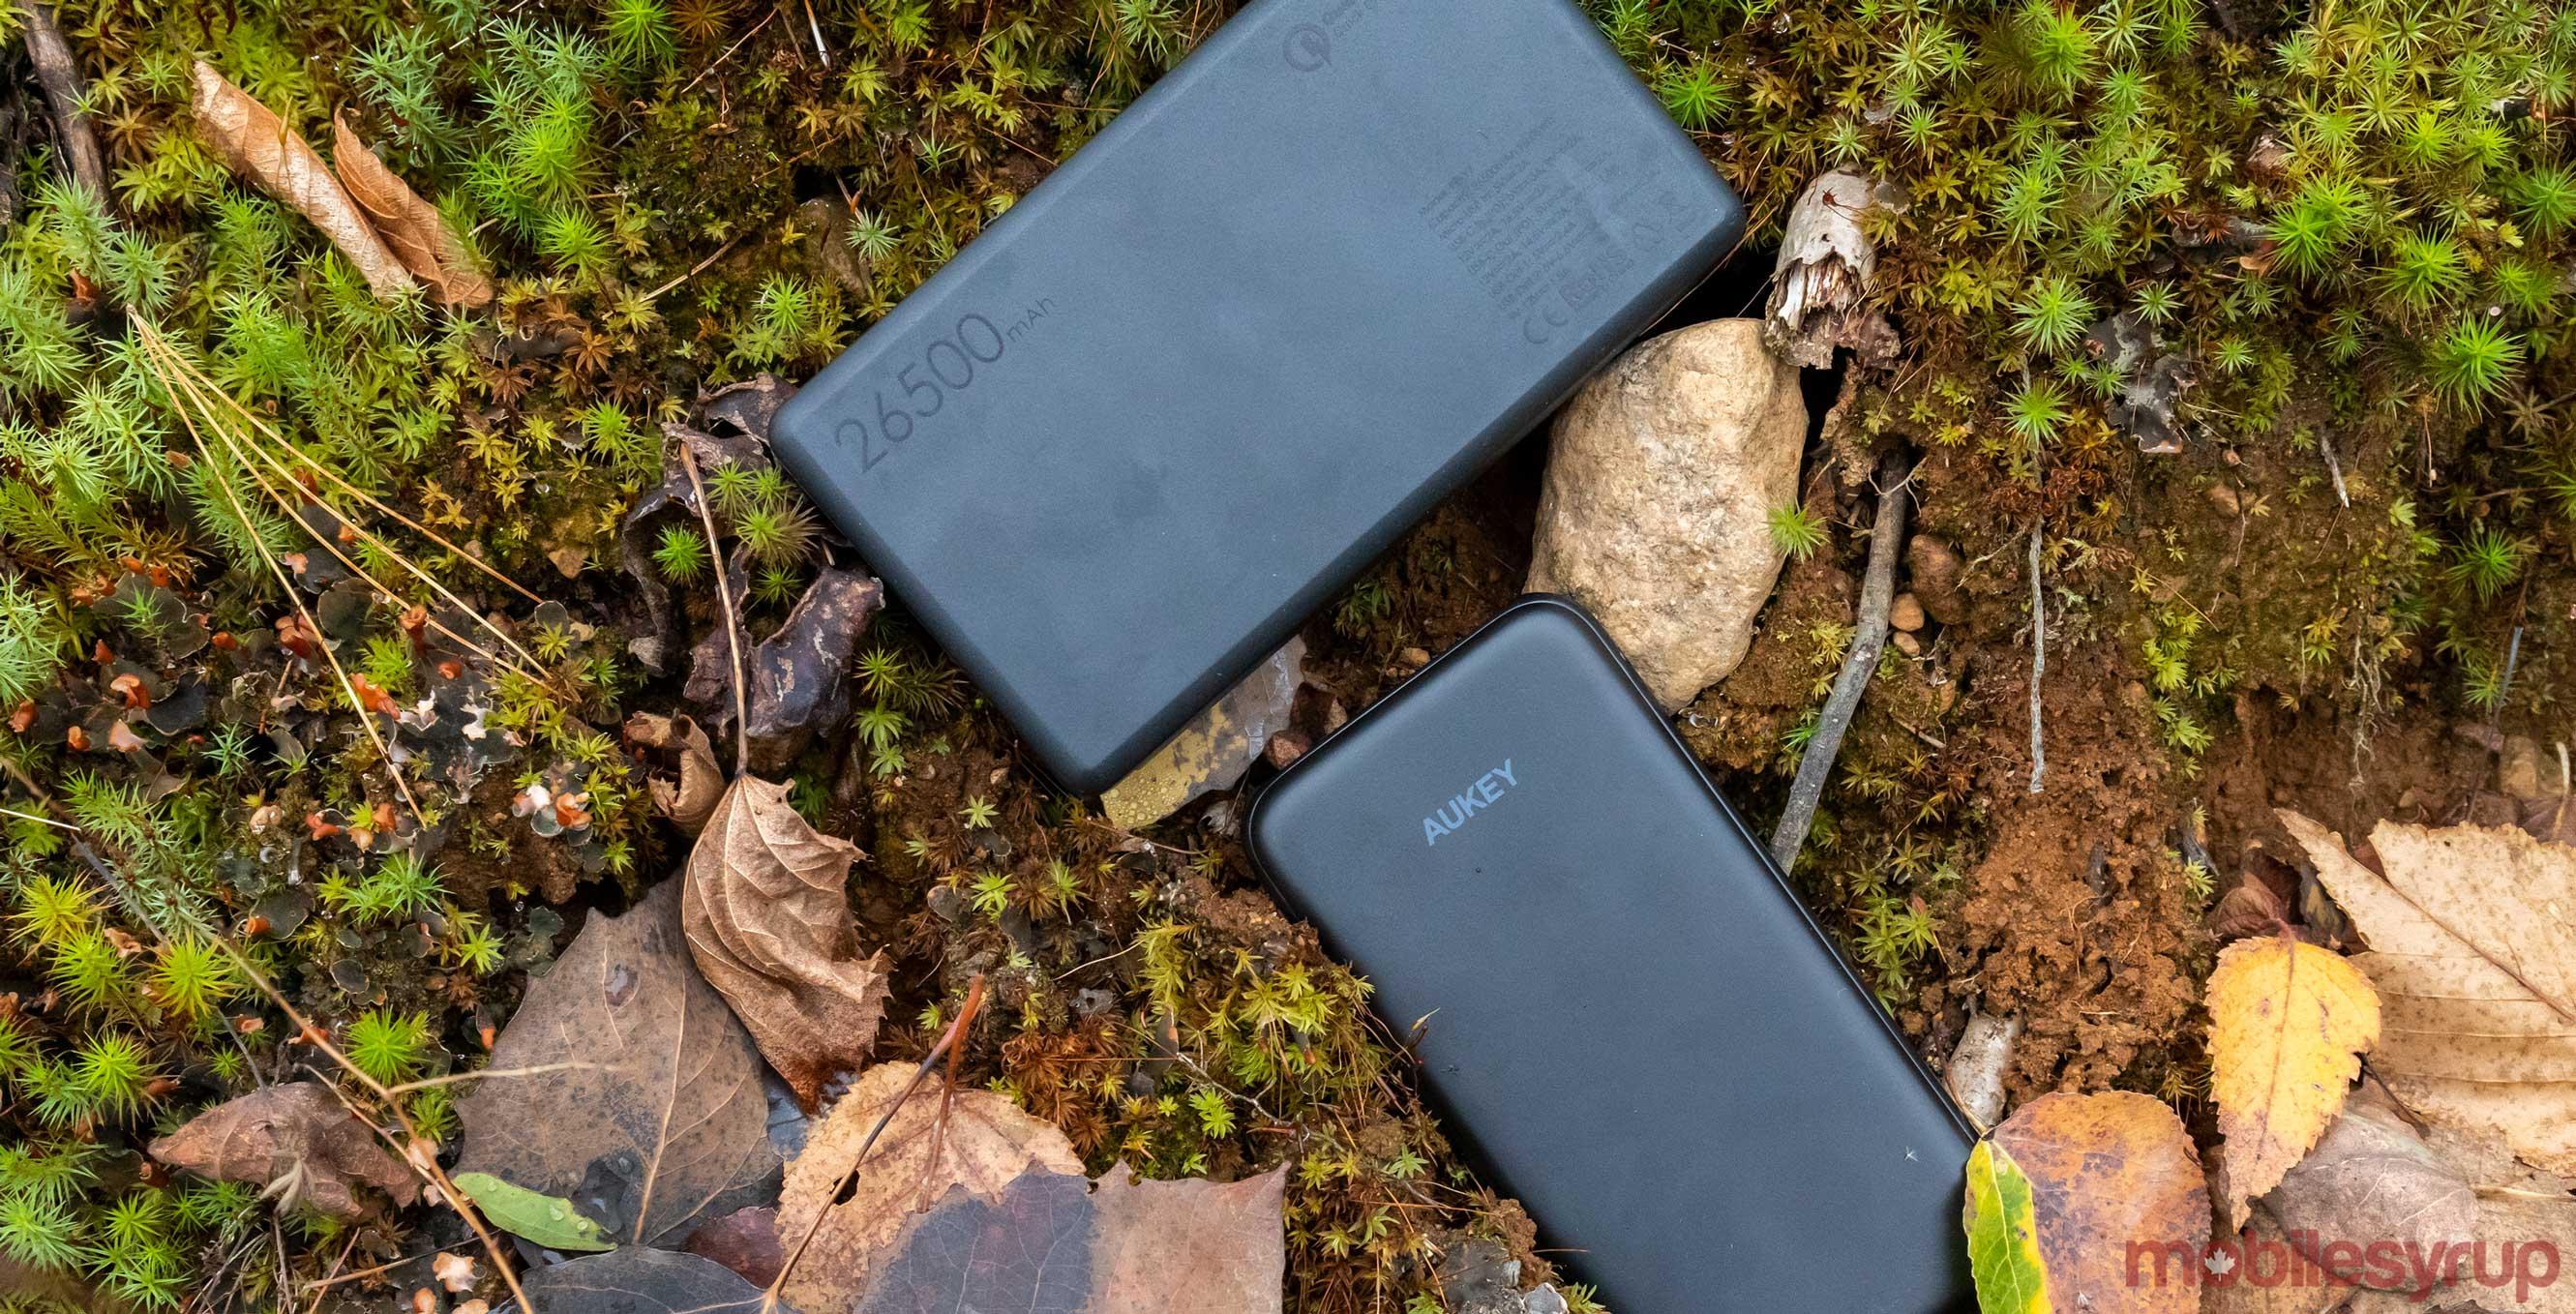 Aukey batteries